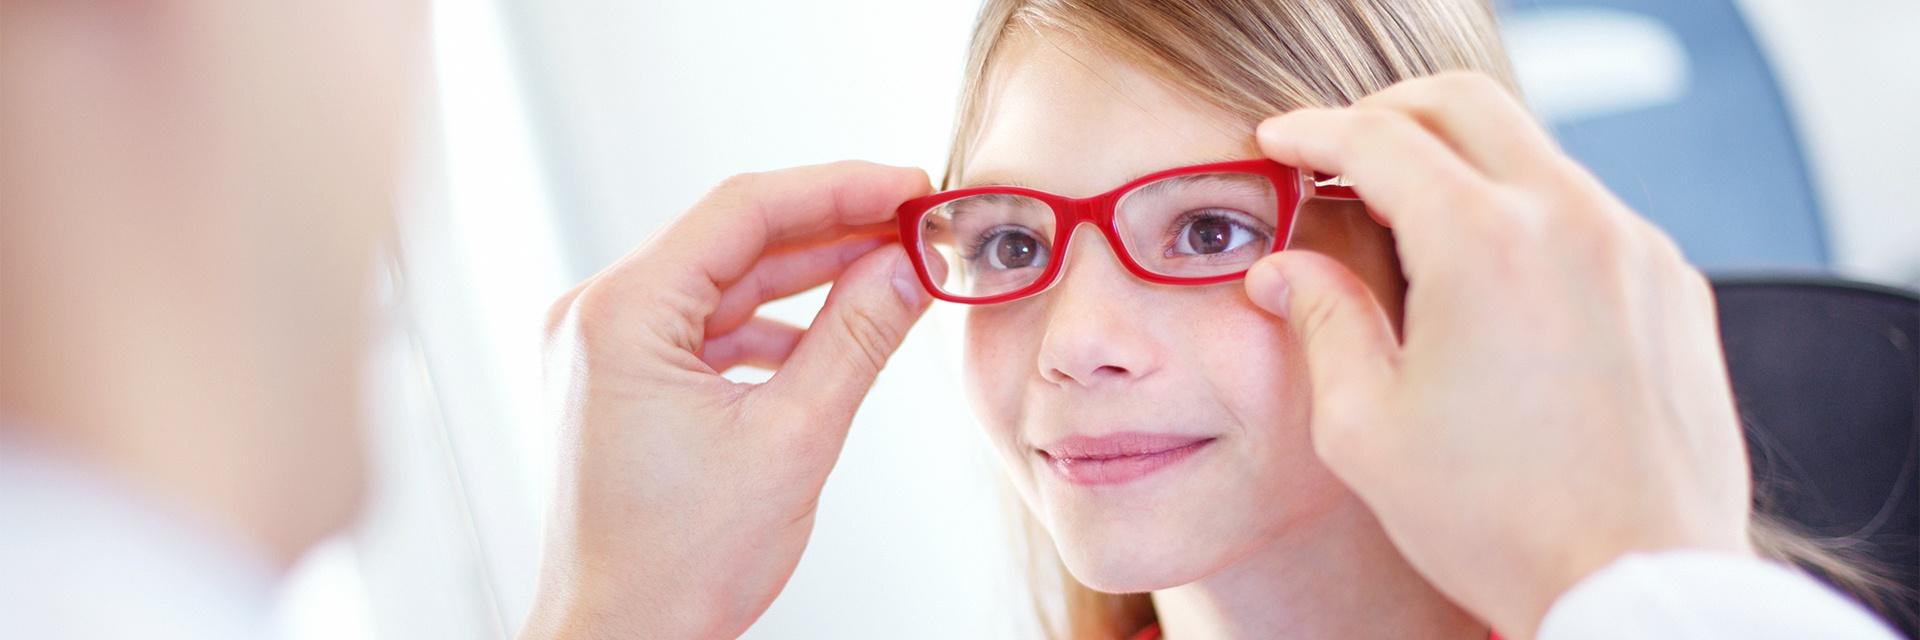 Pediatric Ophthalmology In Iran